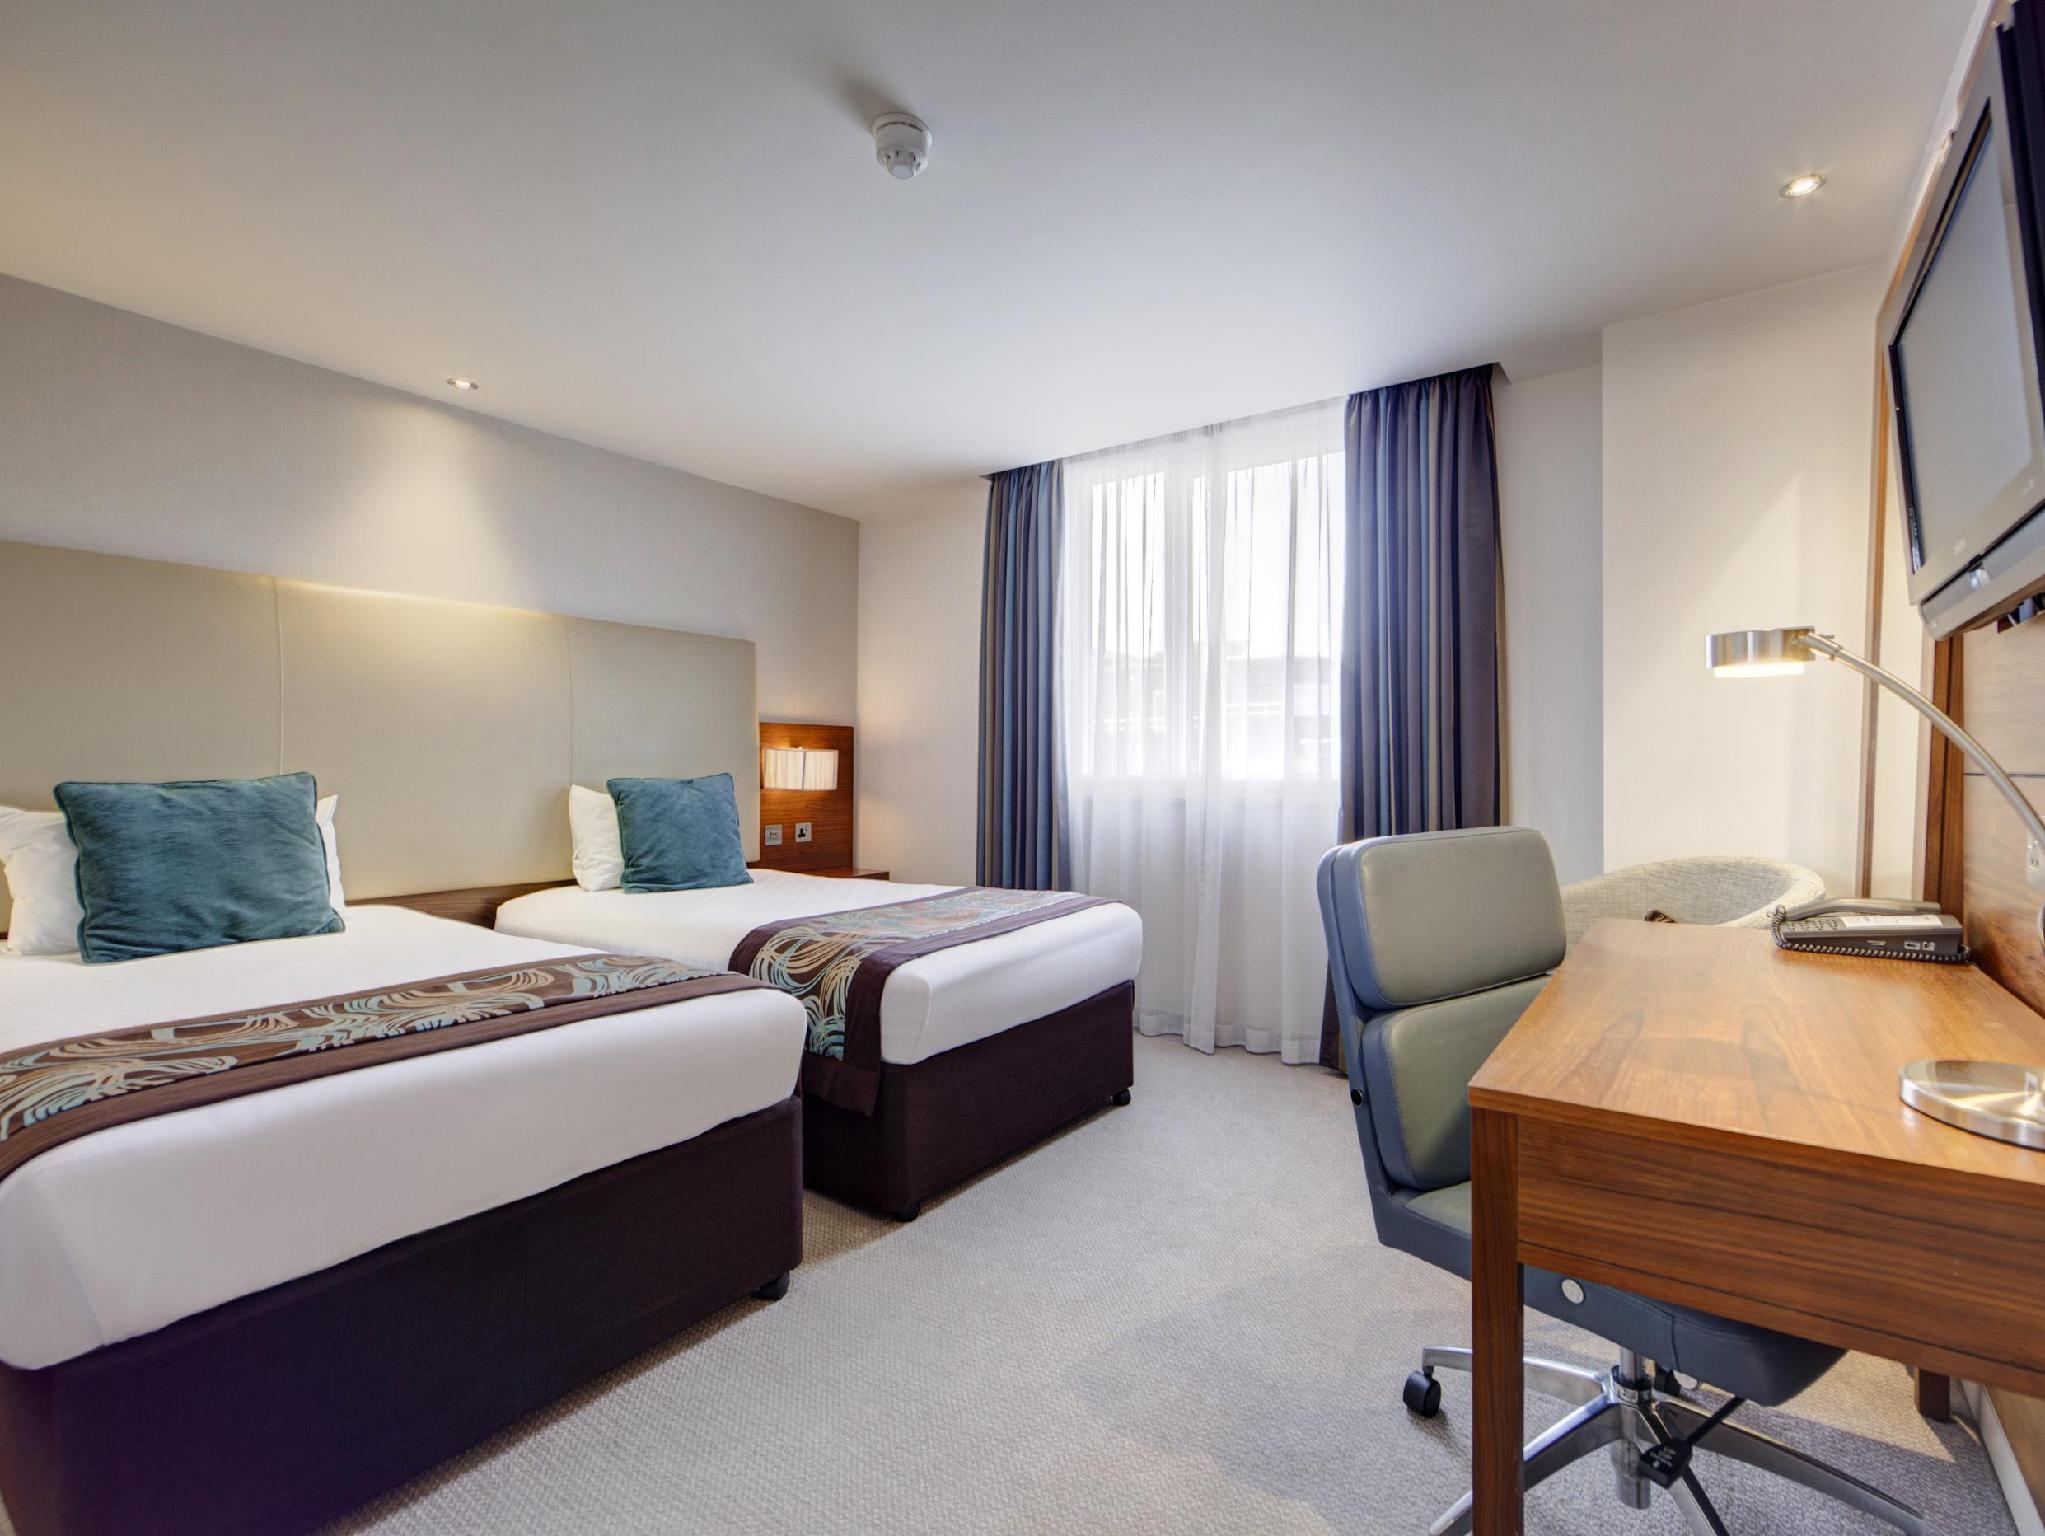 Thistle kensington gardens hotel in london room deals - Thistle kensington gardens hotel ...